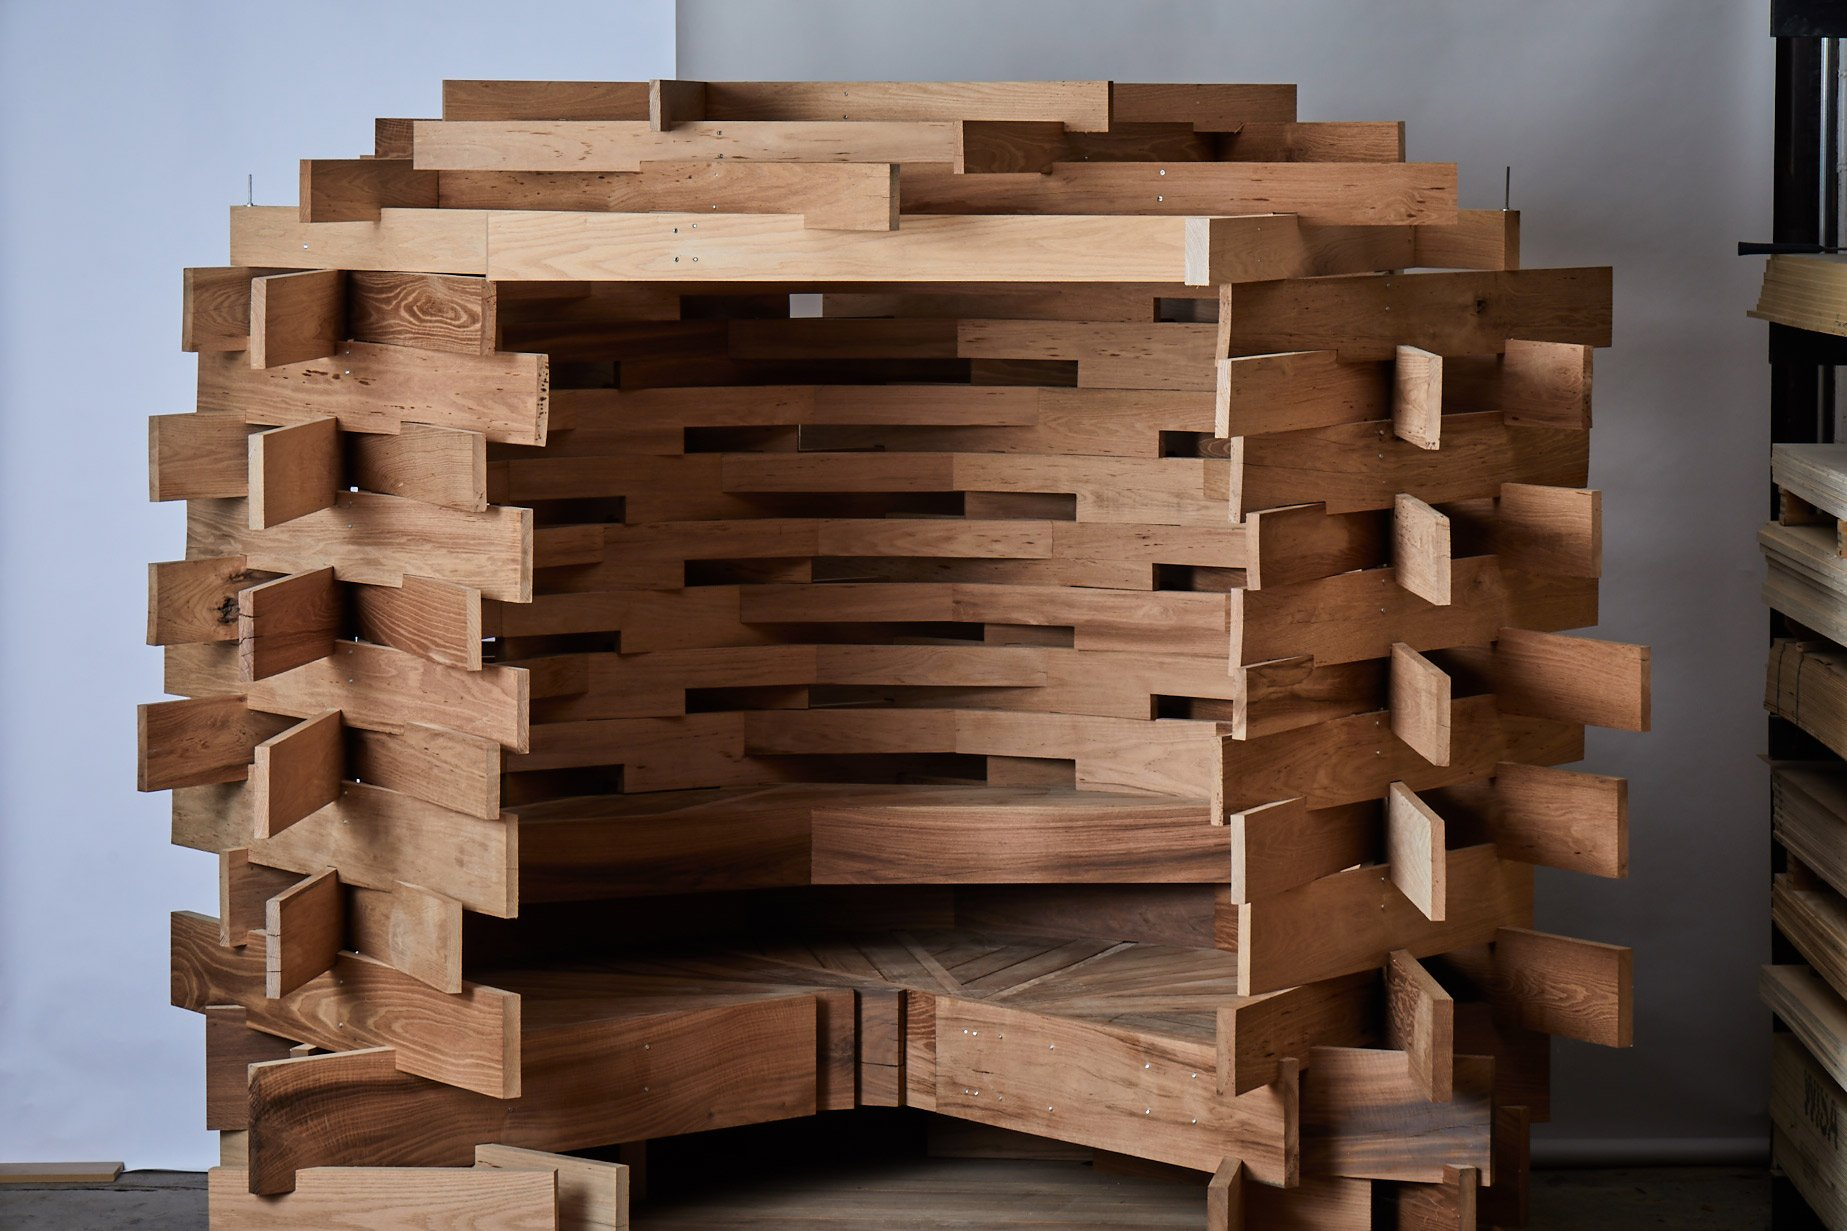 The Nest.Dallas-Pierce-Quintero (Juliet Quintero), commissioned by Sir John Sorrell (London Design F © Petr Krejci